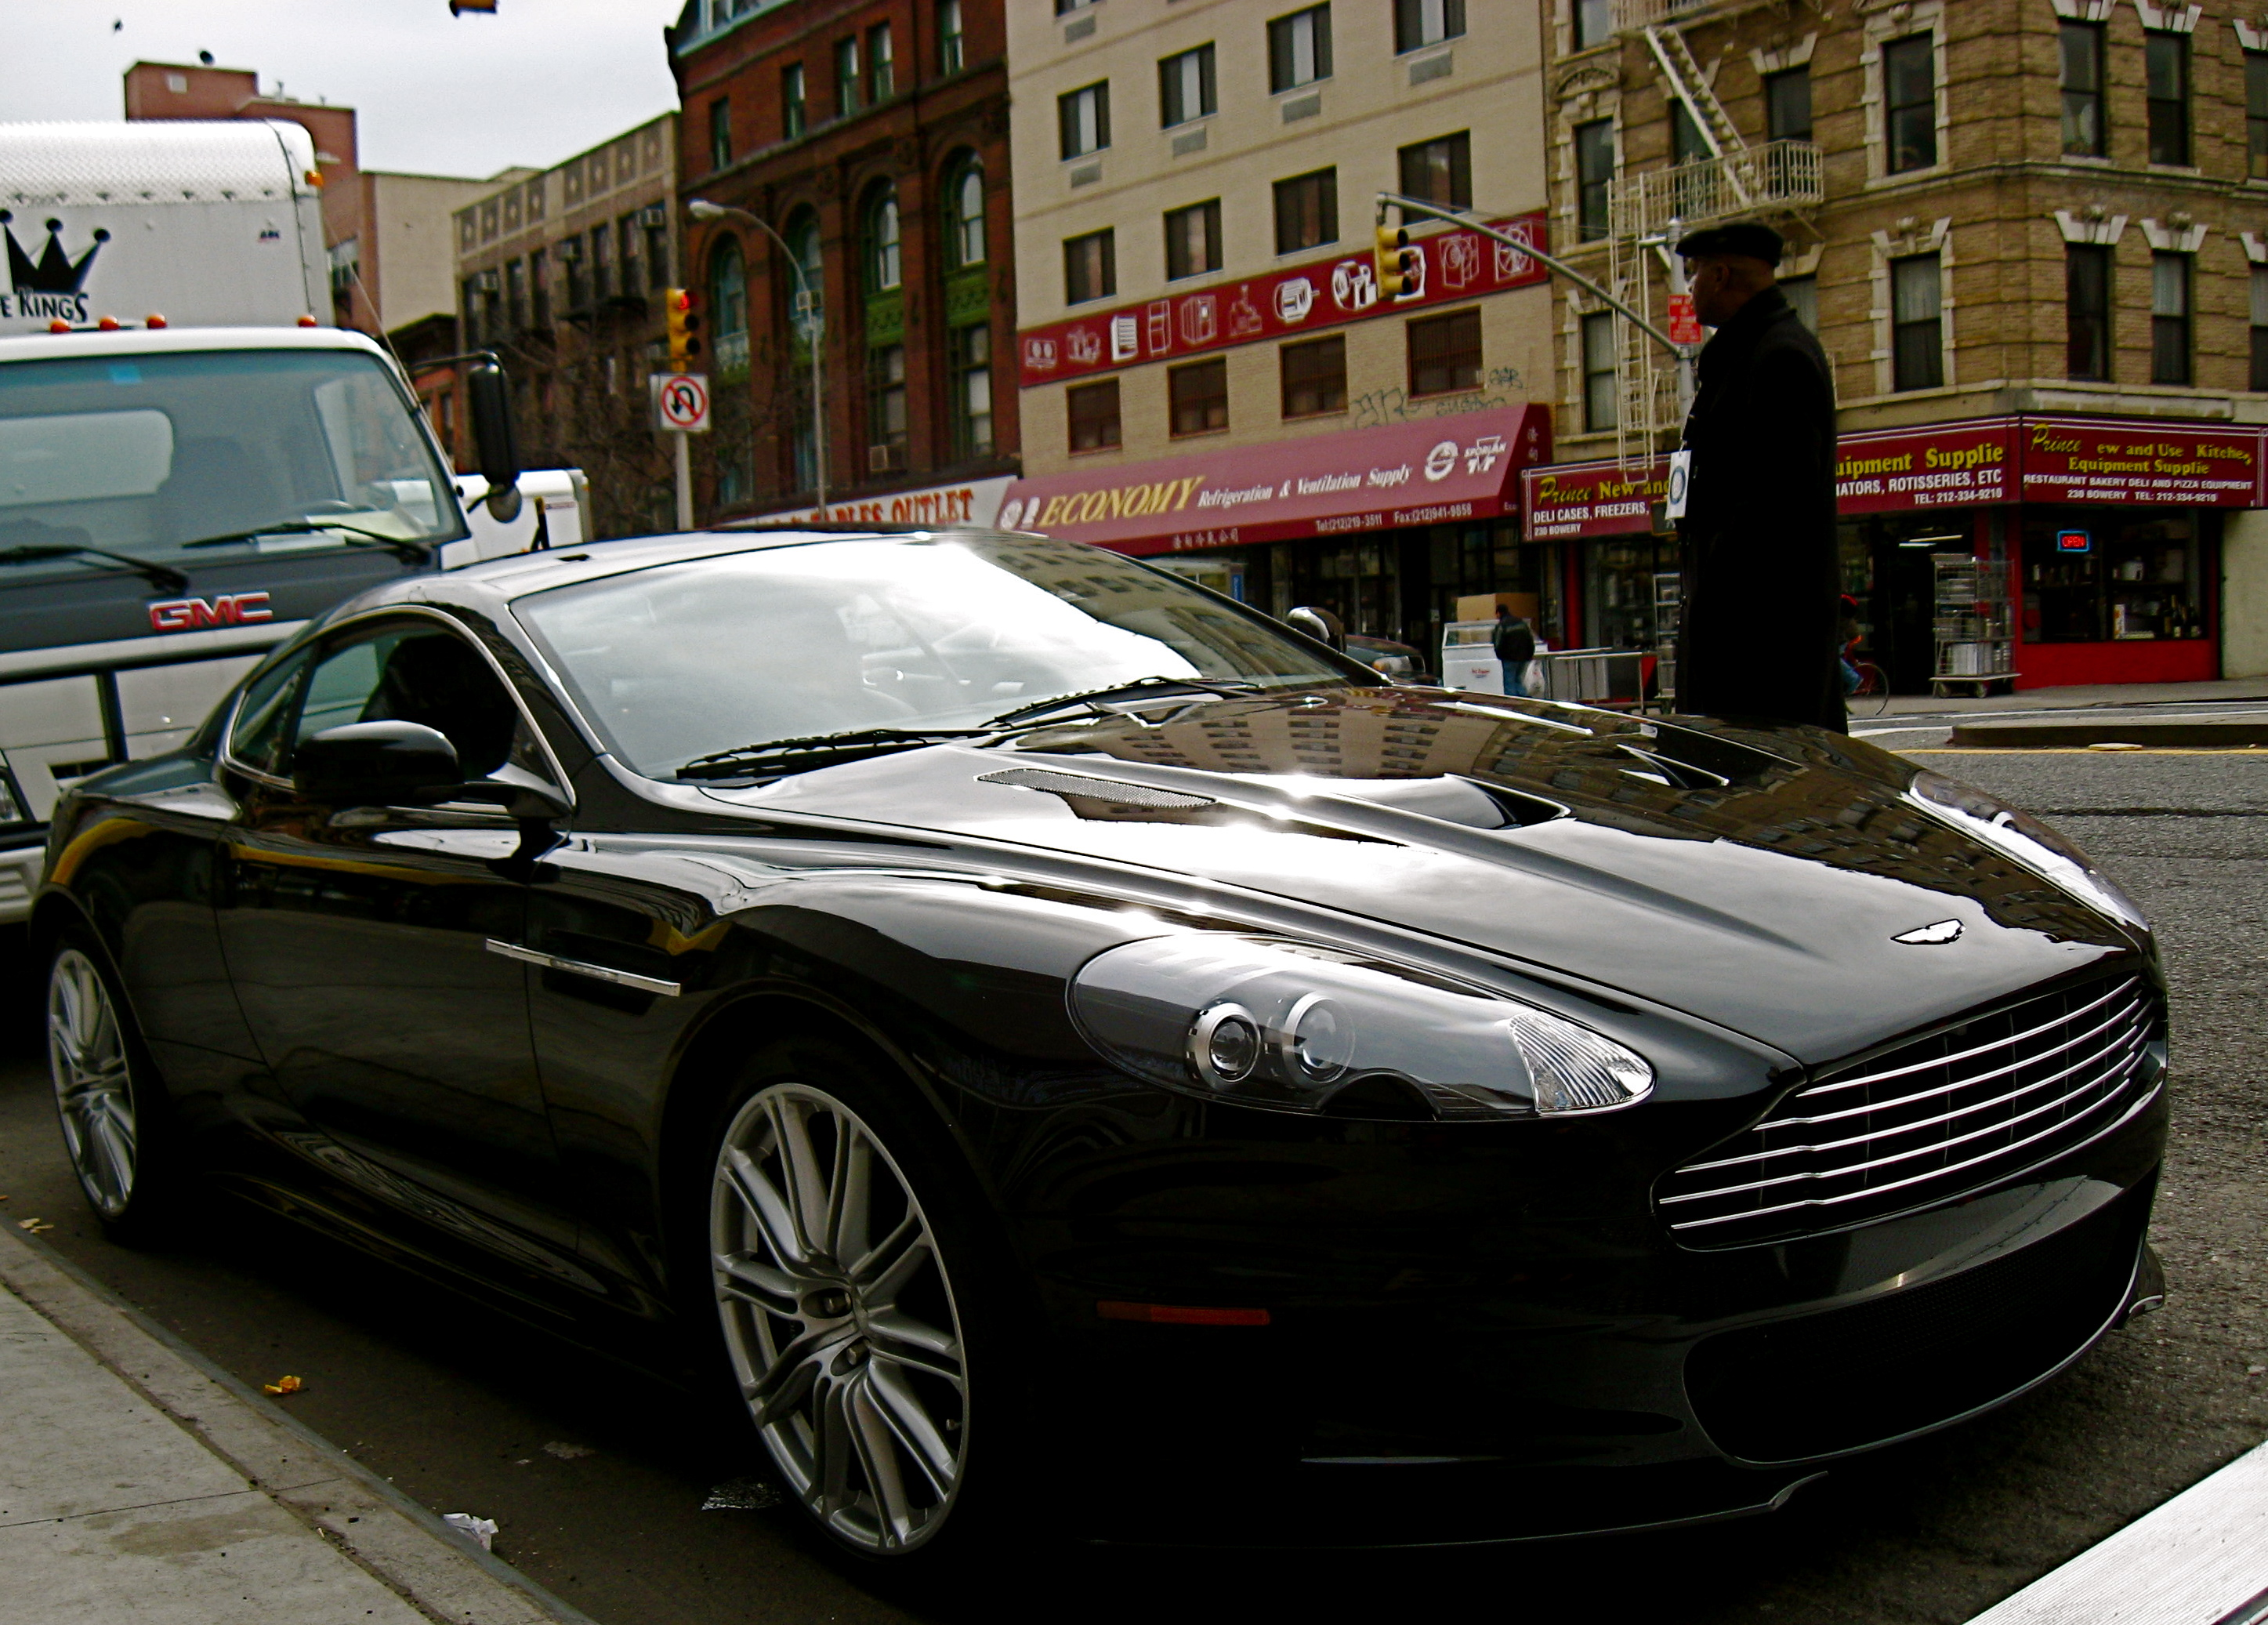 http://upload.wikimedia.org/wikipedia/commons/9/9b/Black_Aston_Martin_DBS_fr.jpg